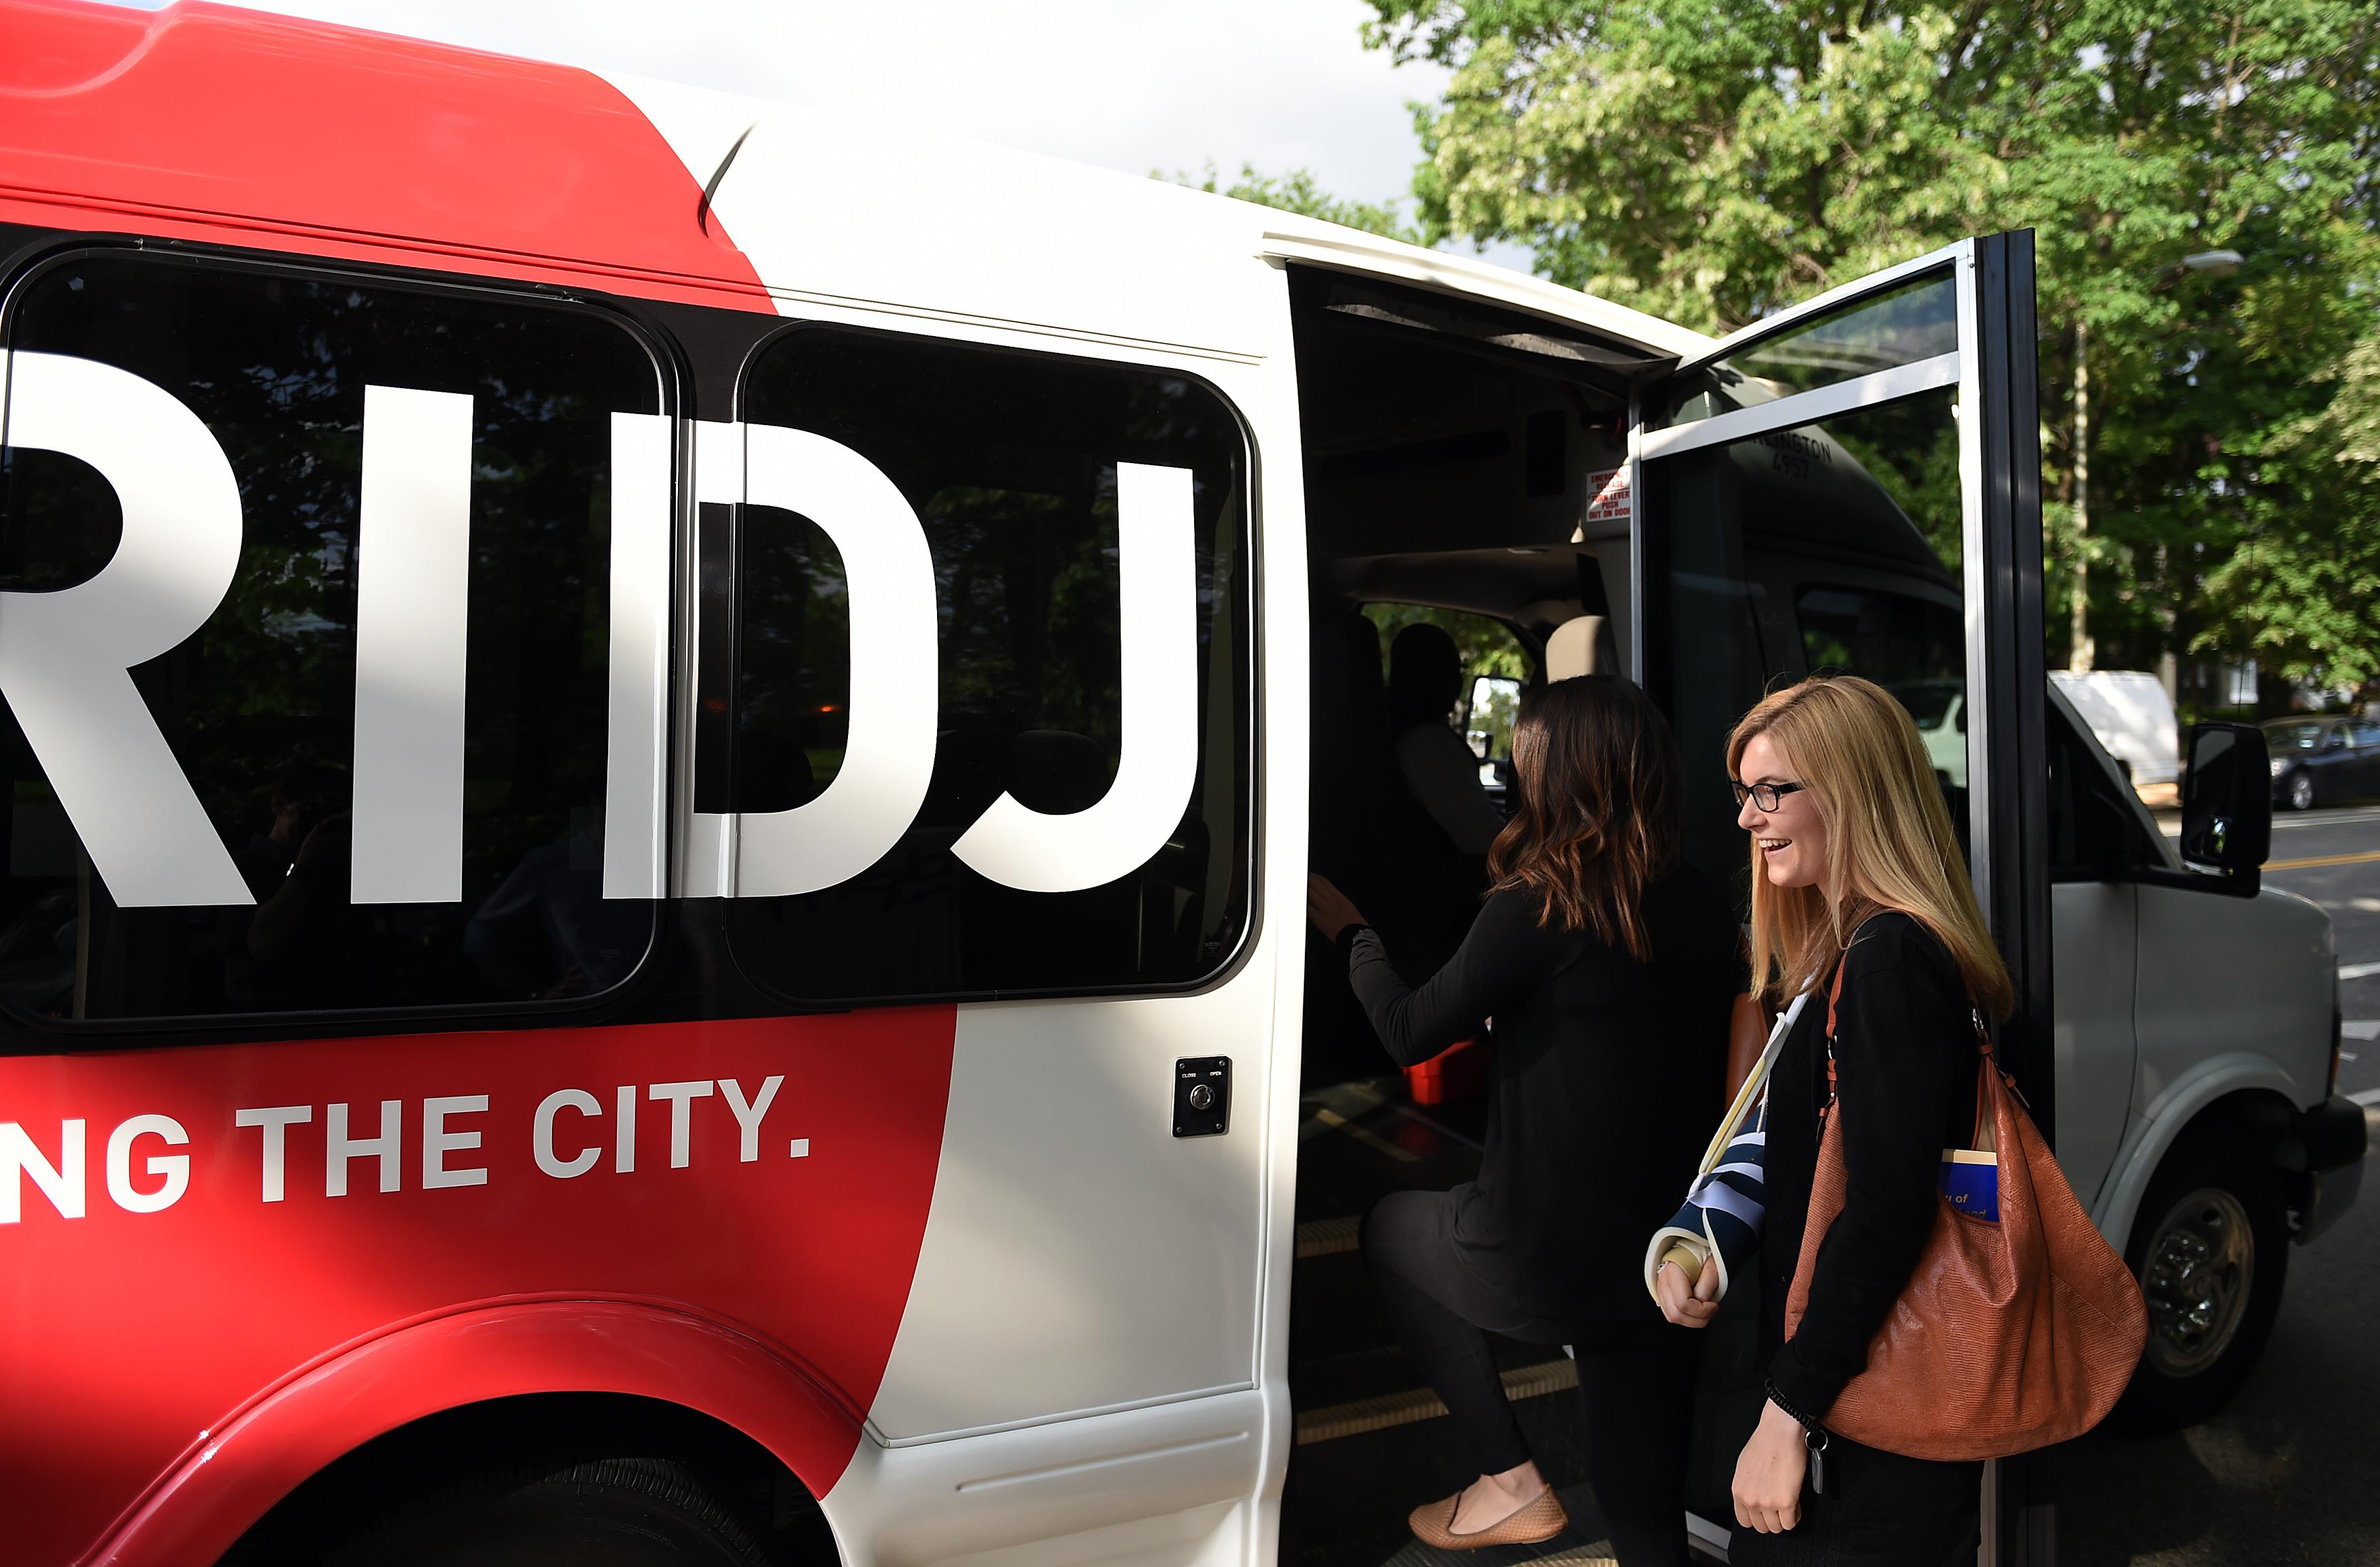 WASHINGTON, DC - May 13: Emily Bastina, 25, boards a Bridj bus